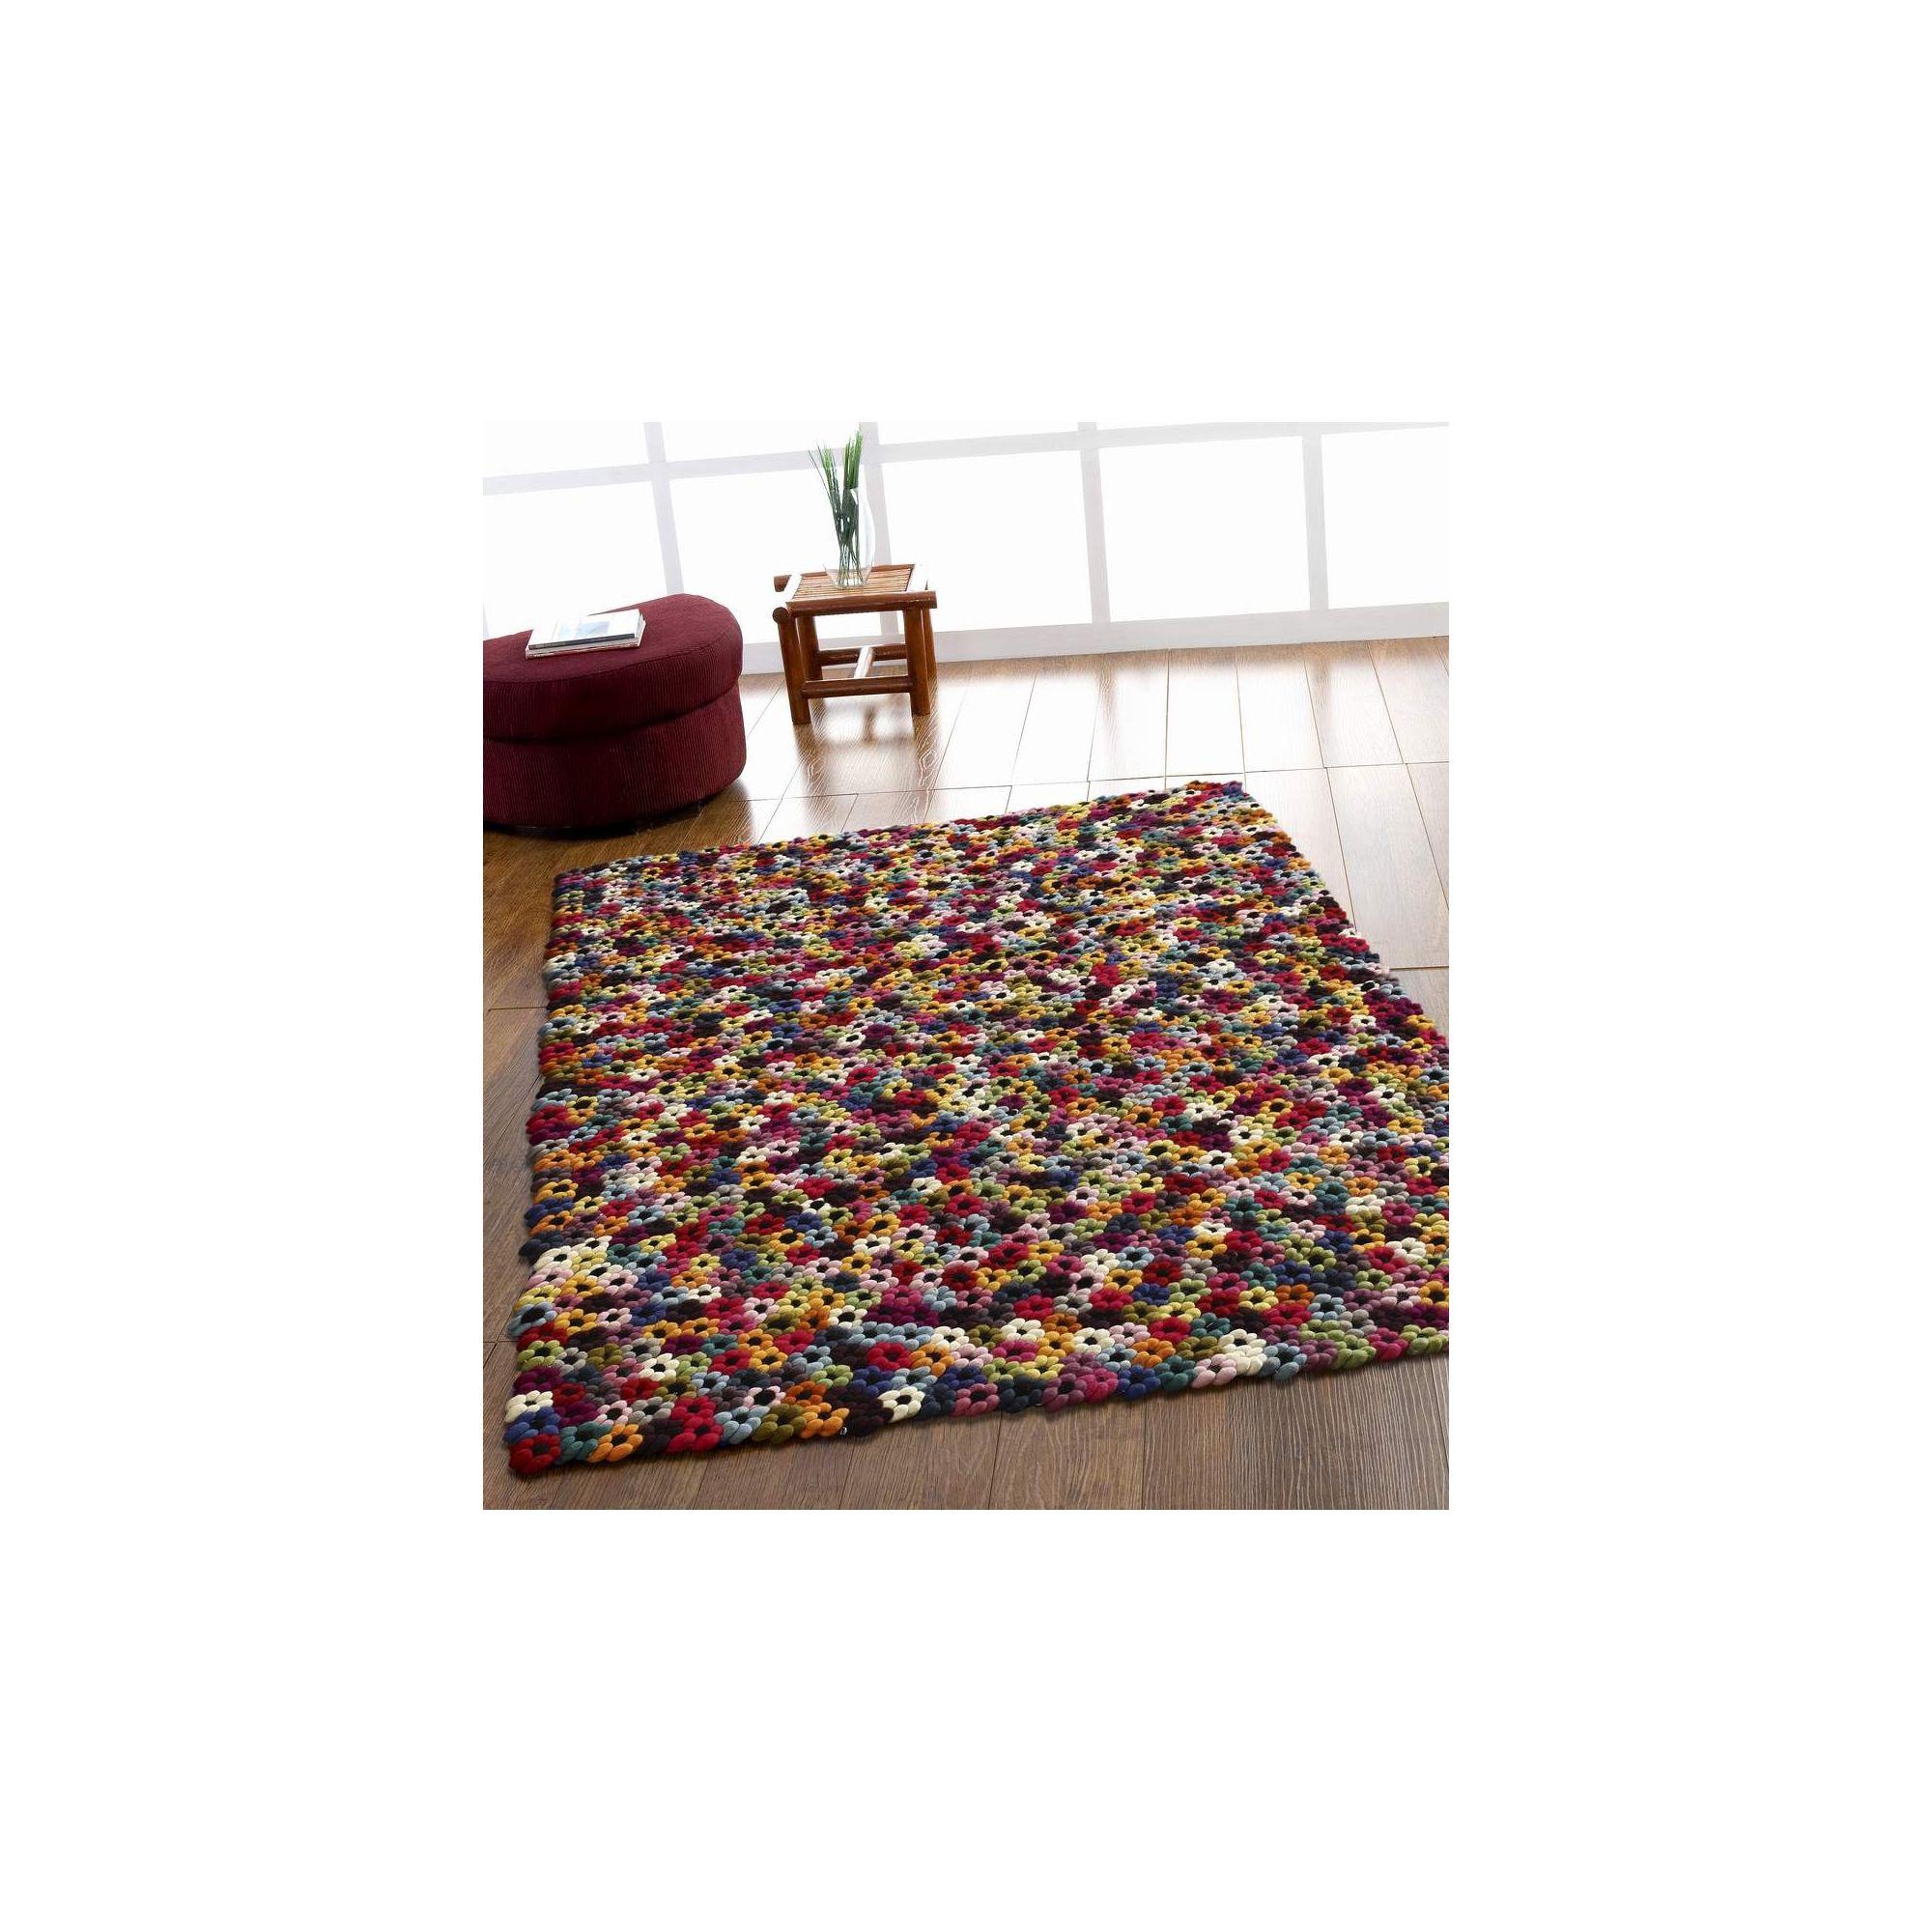 Wilkinson Furniture Bloom Rug in Multicolour - Medium at Tesco Direct